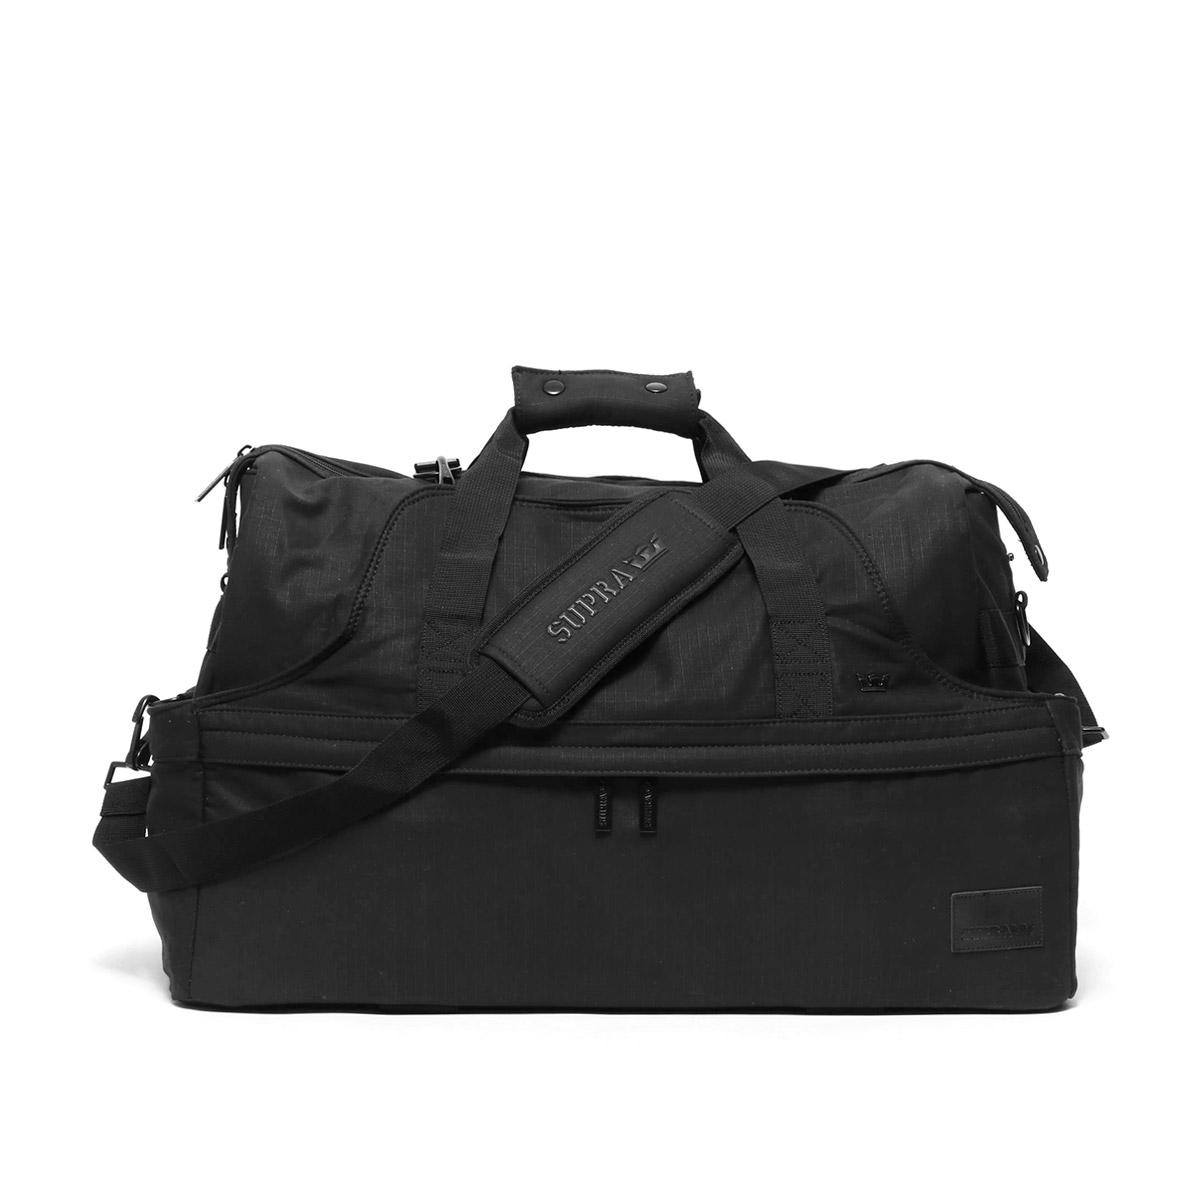 SUPRA TWO-IN-ONE DUFFLE BAG(スープラ ツーインワン ダッフルバッグ)BLACK【メンズ バッグ】14HO-I